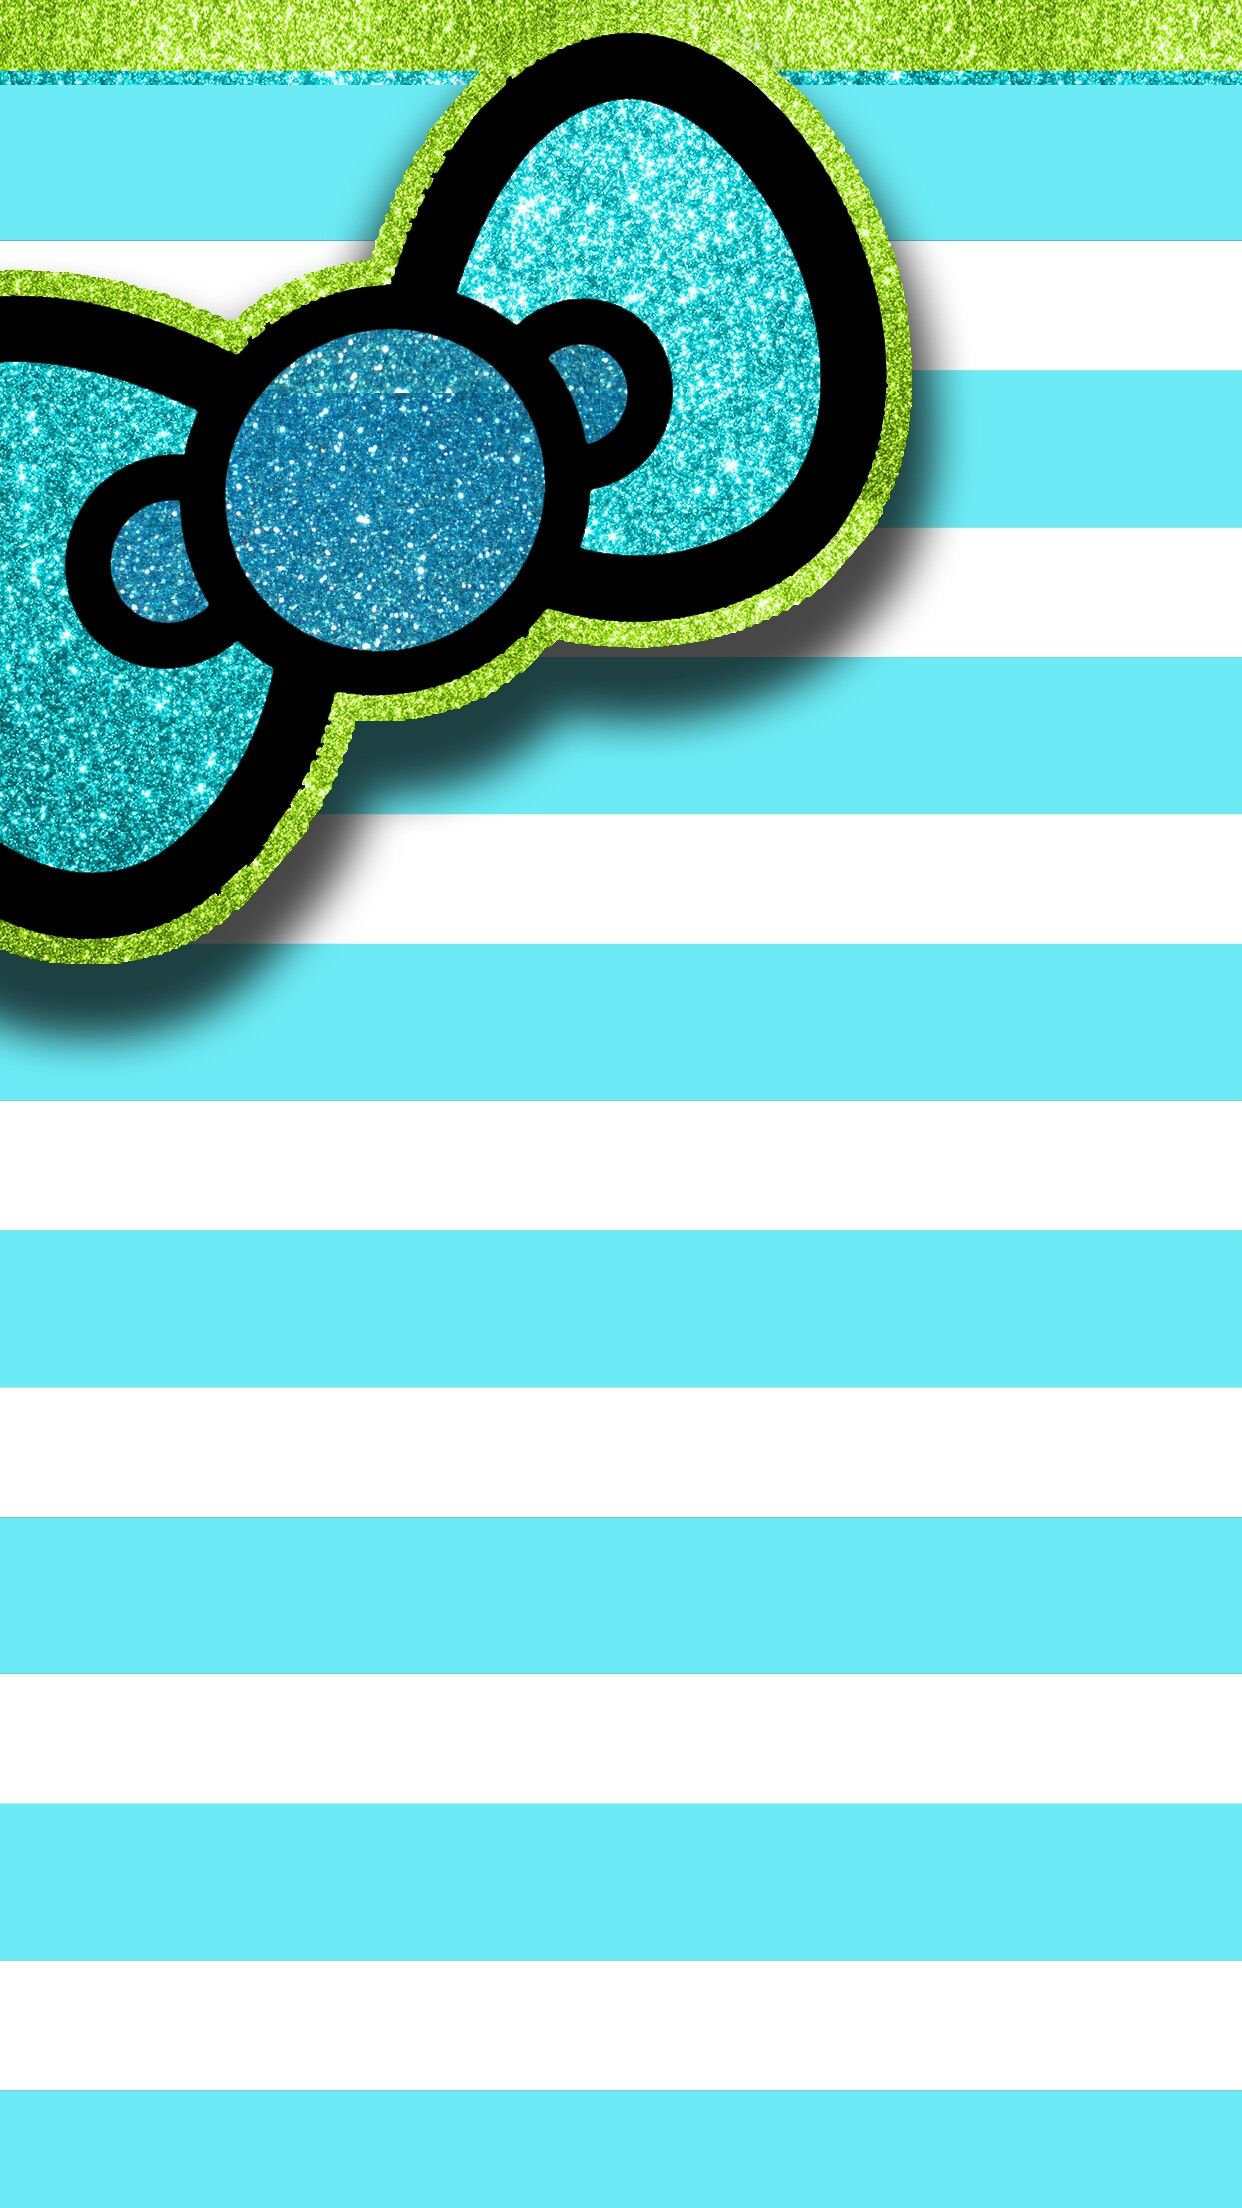 Good Wallpaper Hello Kitty Turquoise - ce1454a16b7e862b8ca195977cb91f9f  Gallery_92669.jpg